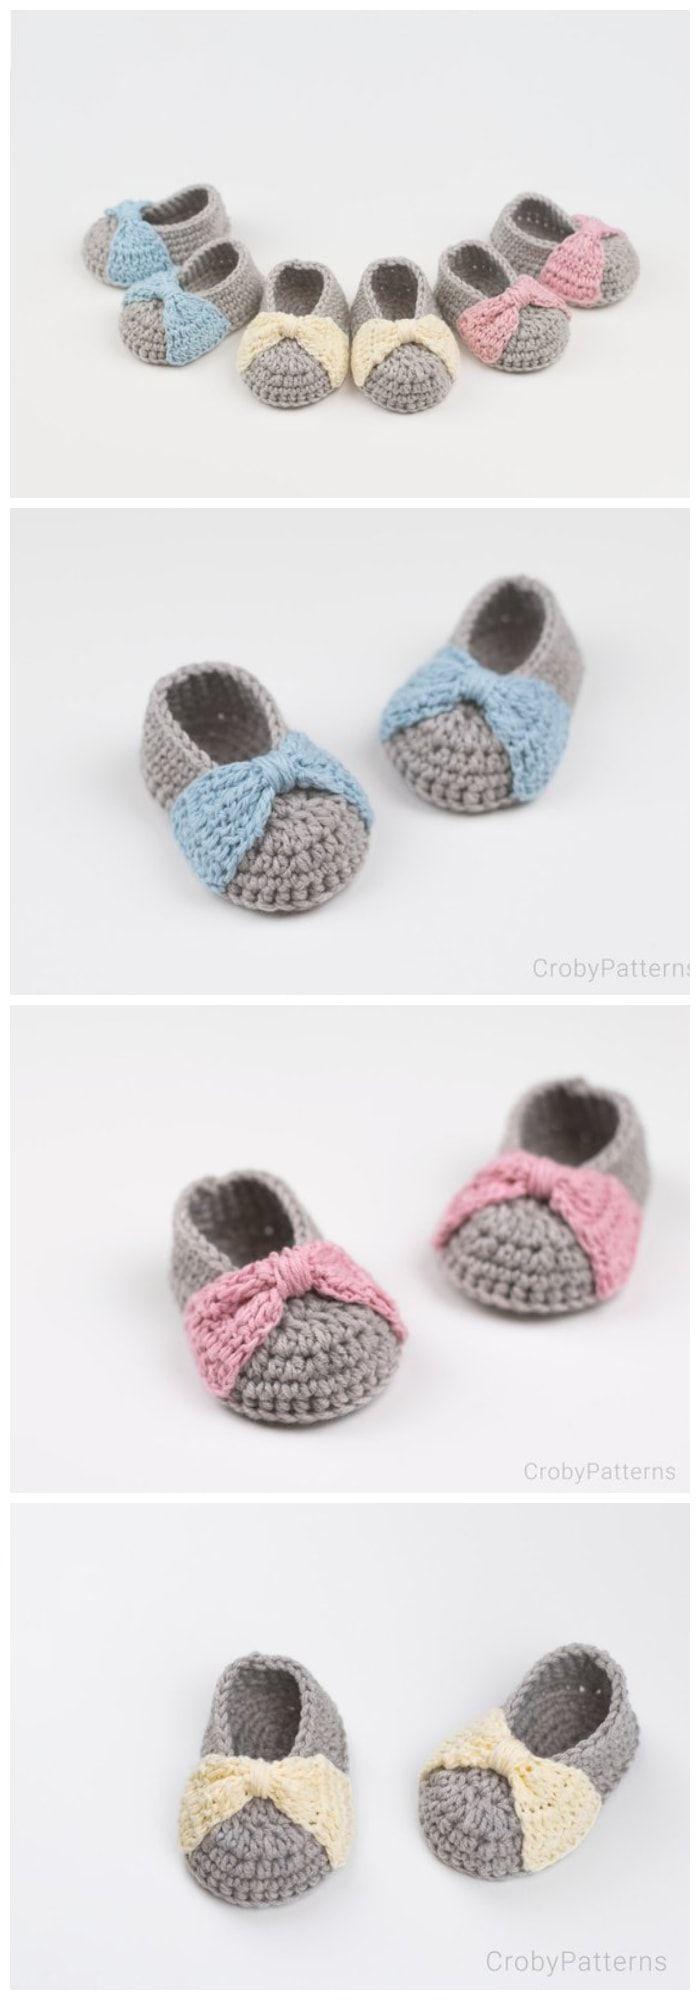 16 Free Crochet Baby Booties | Booties, slippers & baby things ...